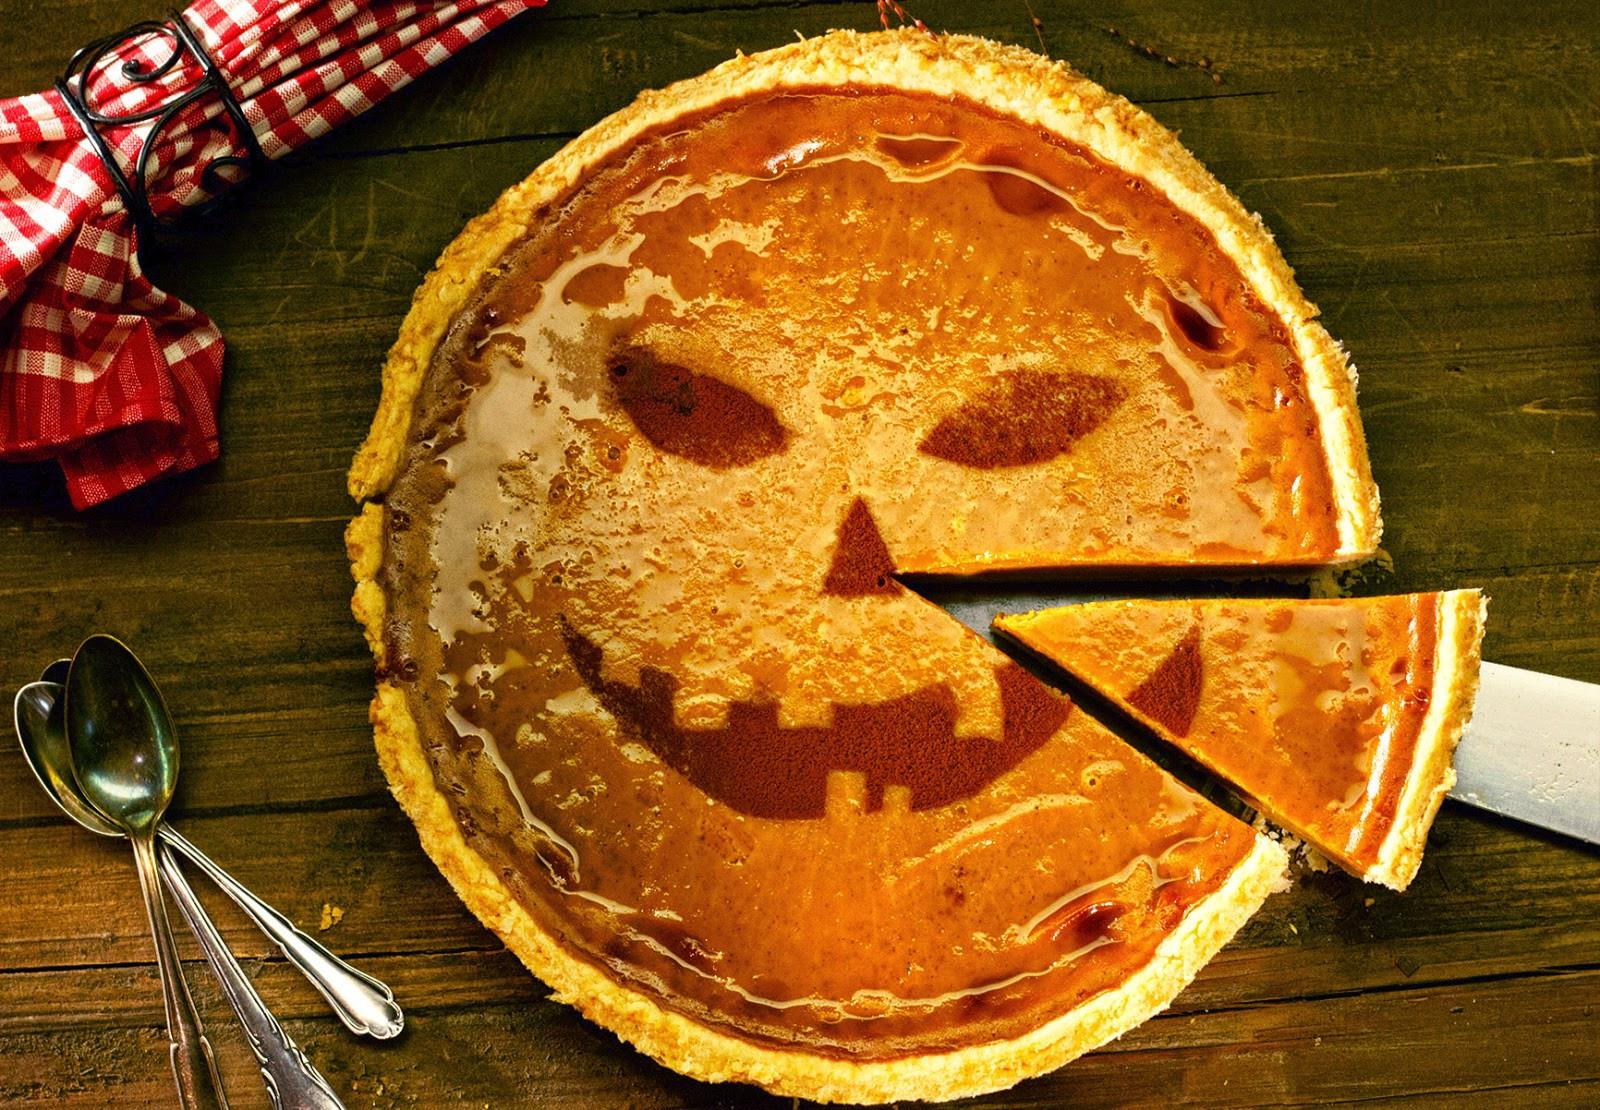 Halloween Pumpkin Pie  Intelliblog FOOD FRIDAY HALLOWEEN PUMPKIN PIE